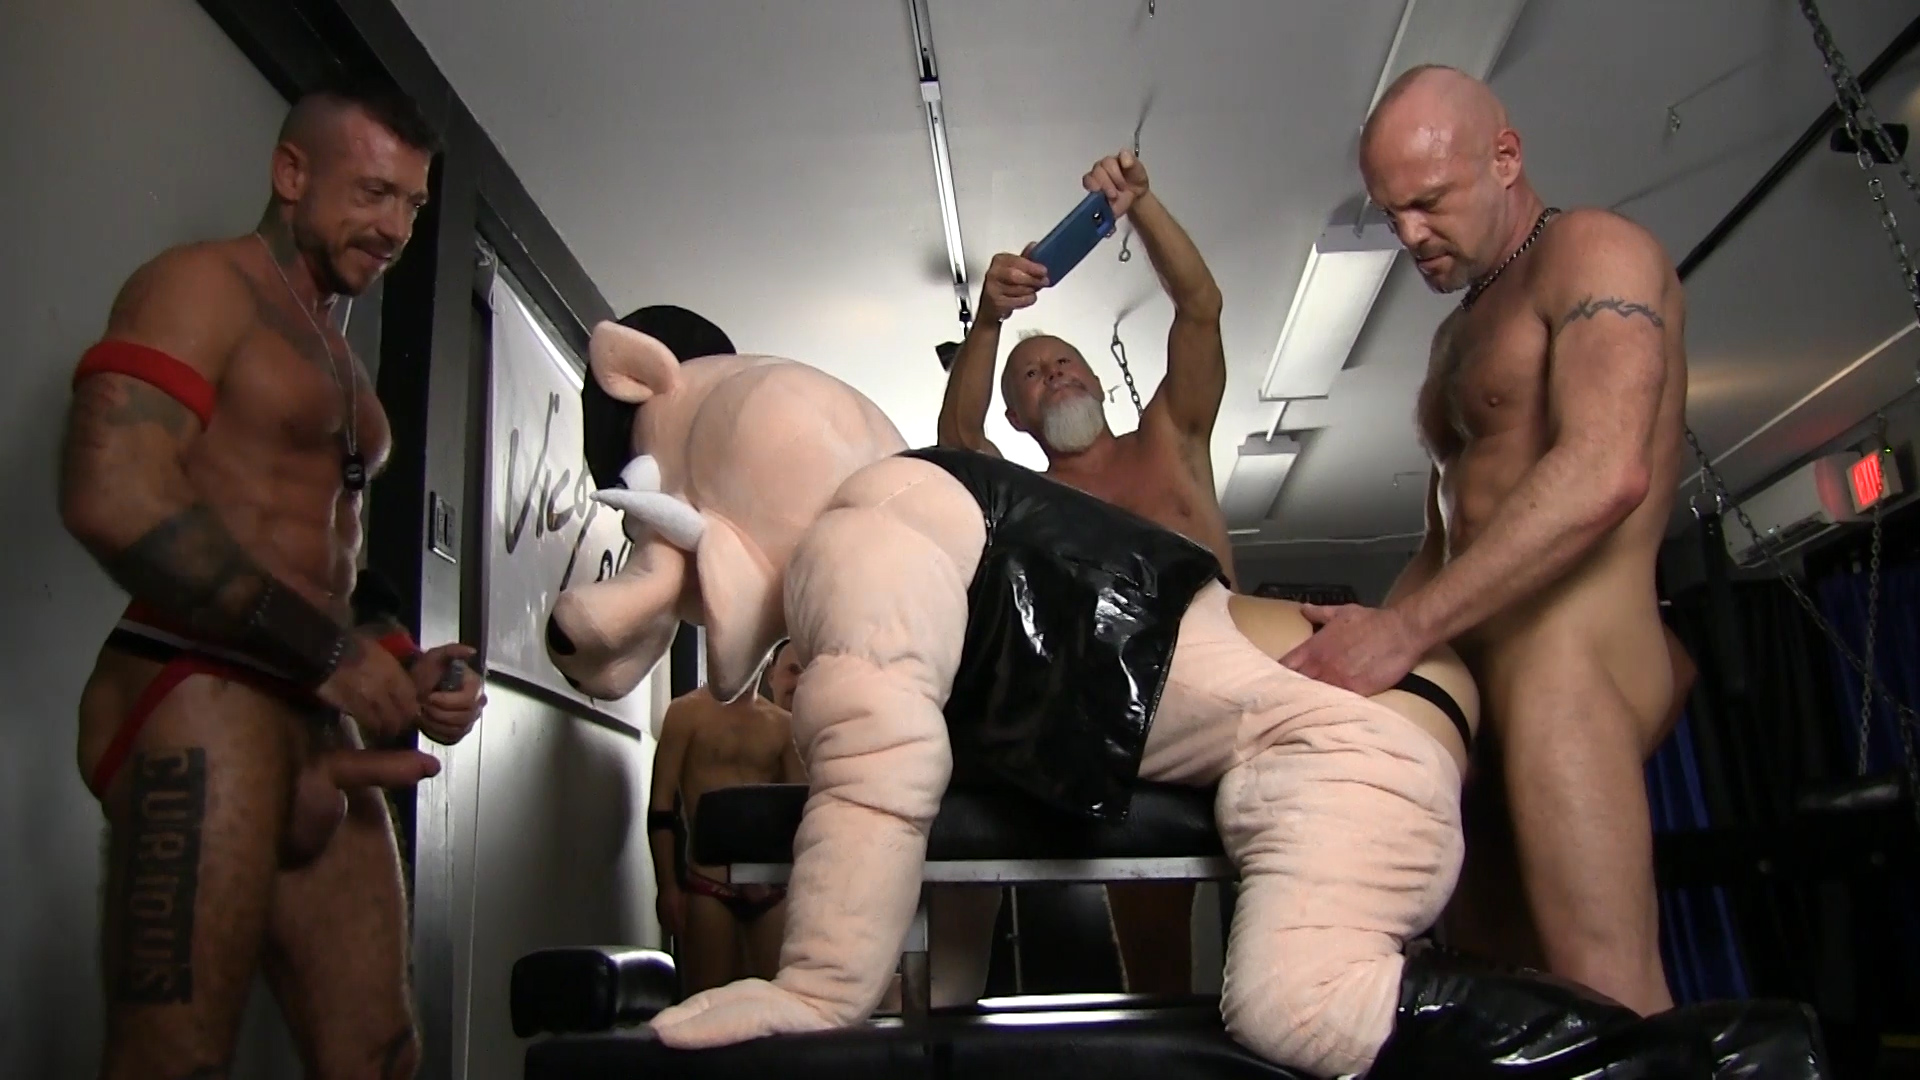 Gorilla tube porn